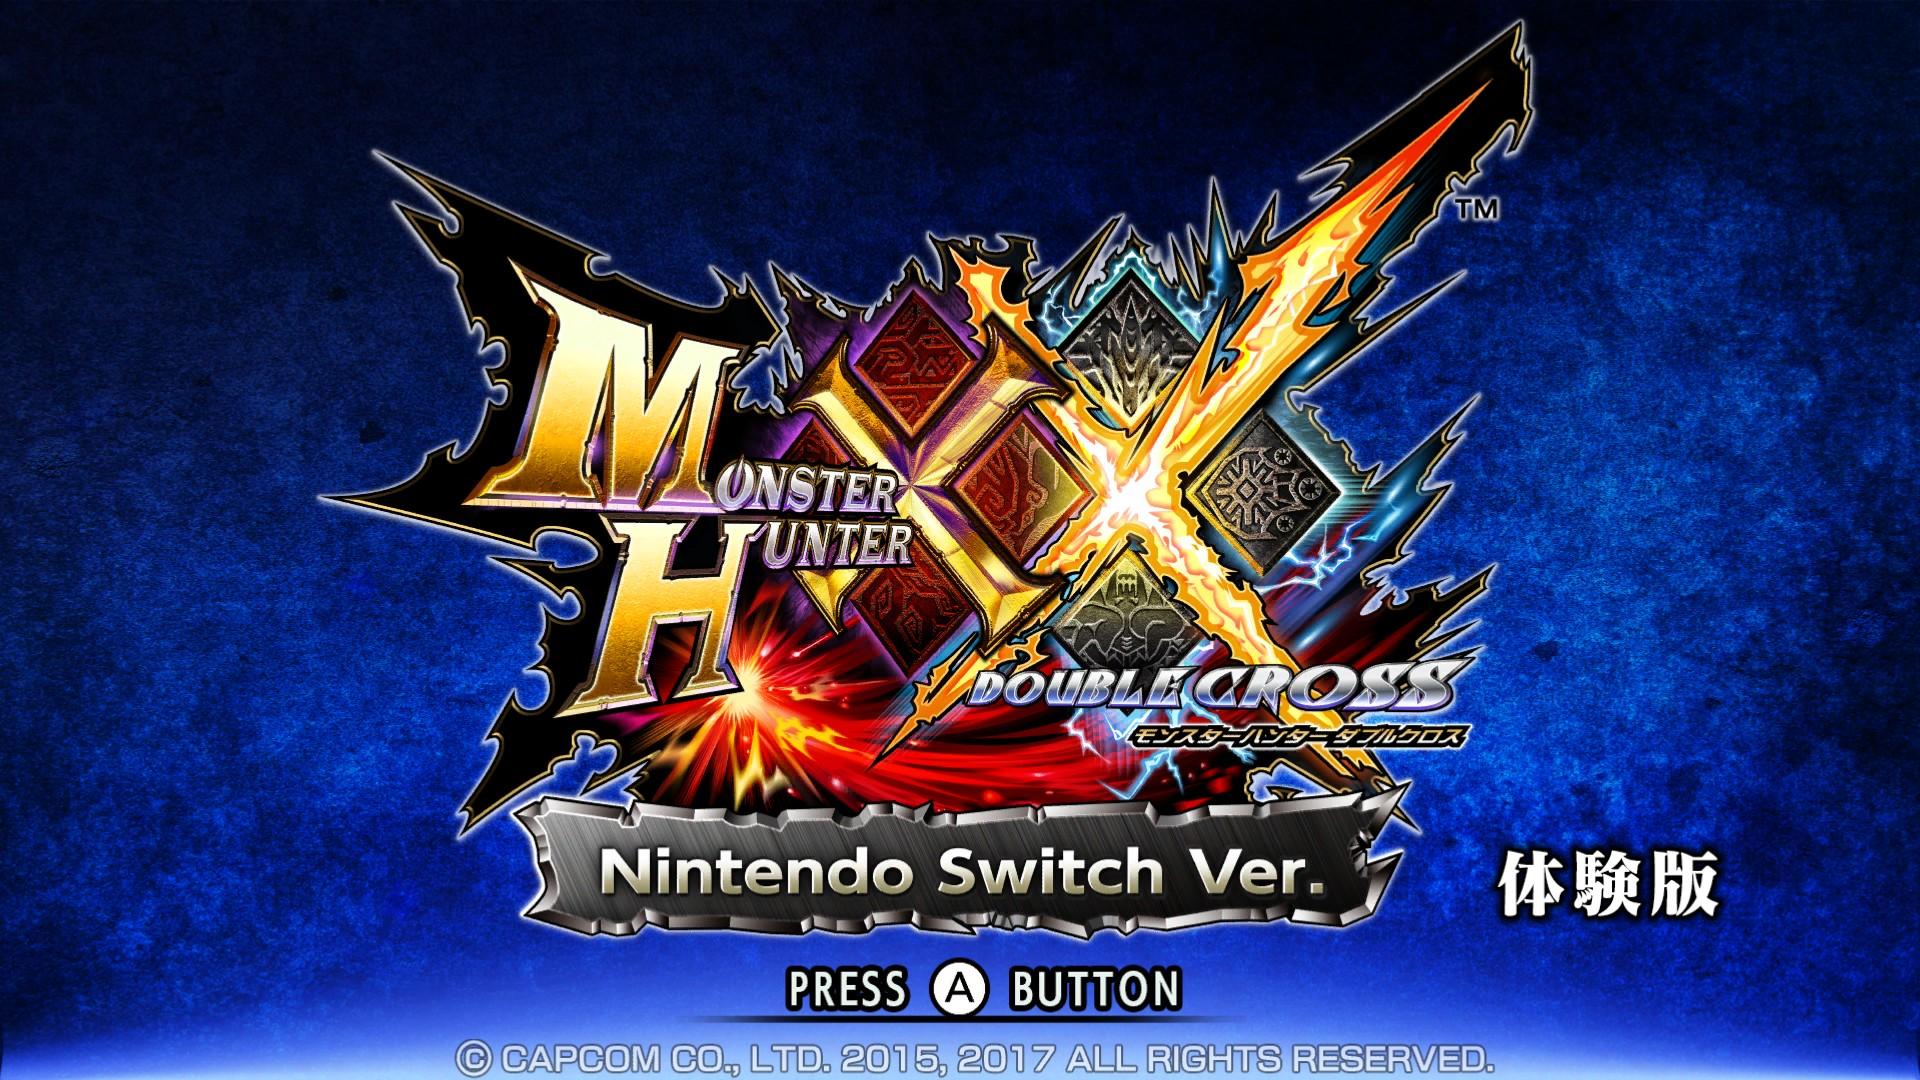 Monster-Hunter-XX-Nintendo-Switch-Ver_2017_06-26-17_001